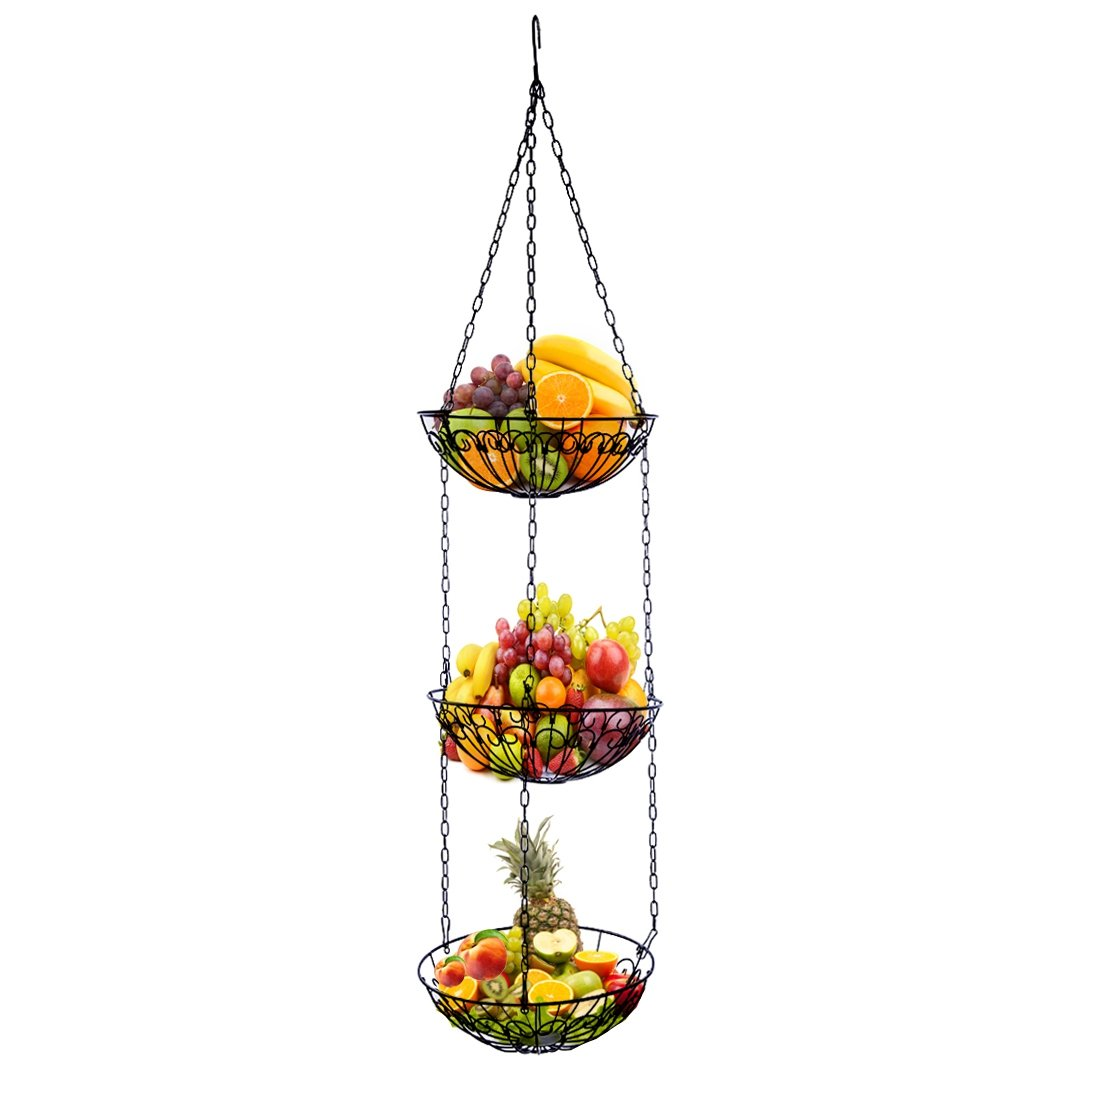 Petforu 3-Tier Kitchen Hanging Baskets Fruit Bowl Vegetable Holder Storage Simple Functional with Chains